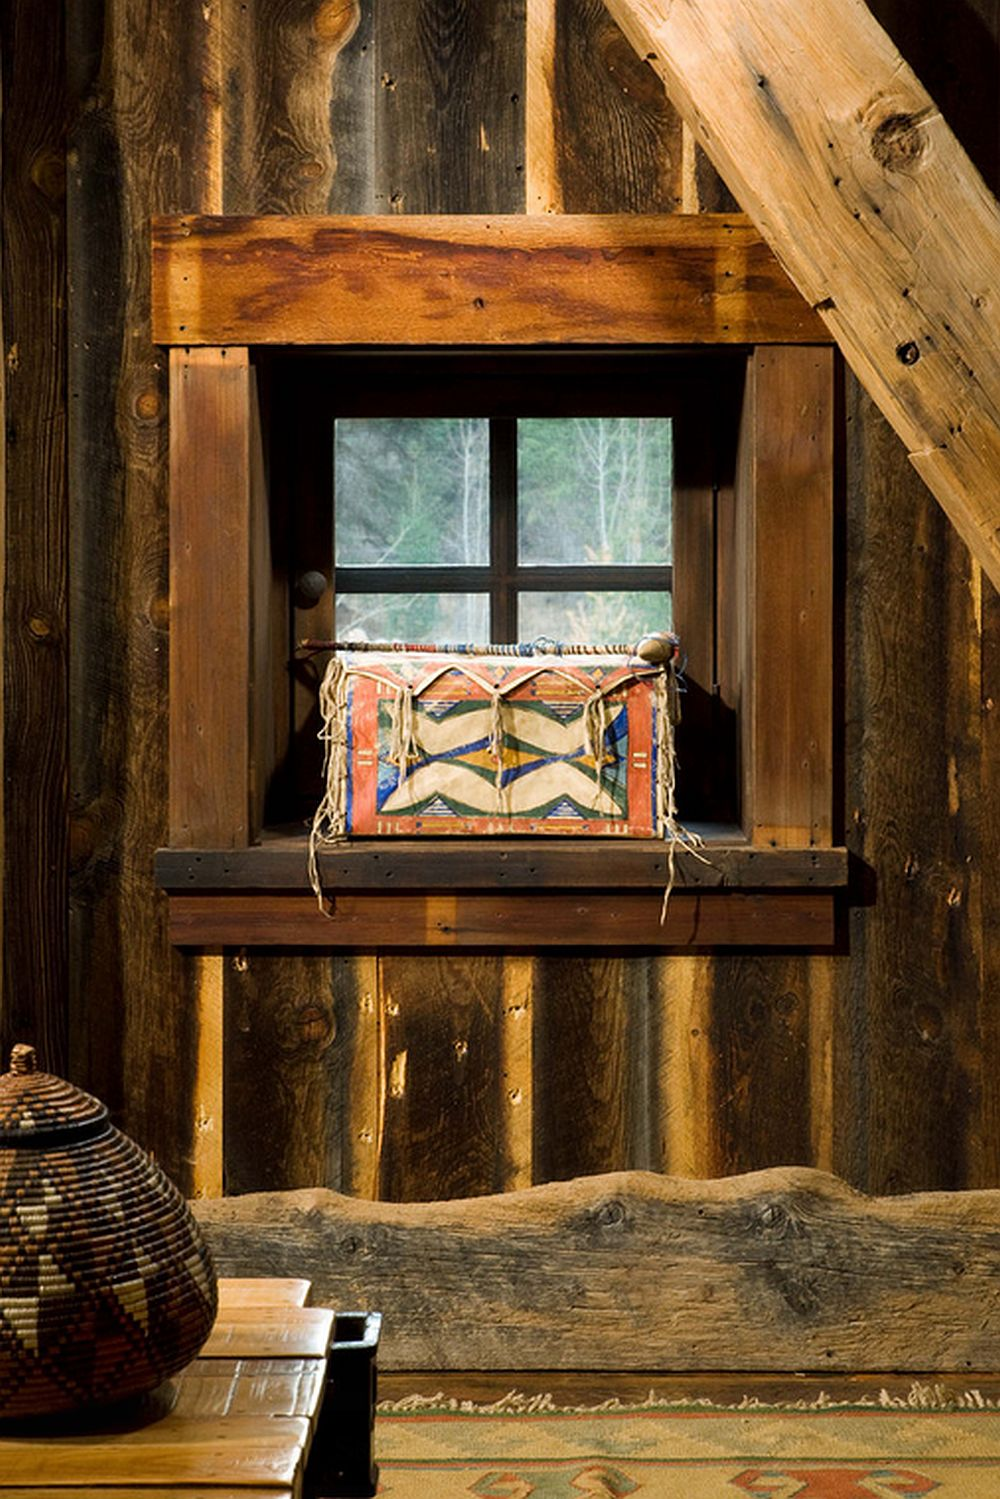 adelaparvu.com despre cabana din lemn vechi recuperat, cabana Swan Valley, Montana, RMT Architects (3)